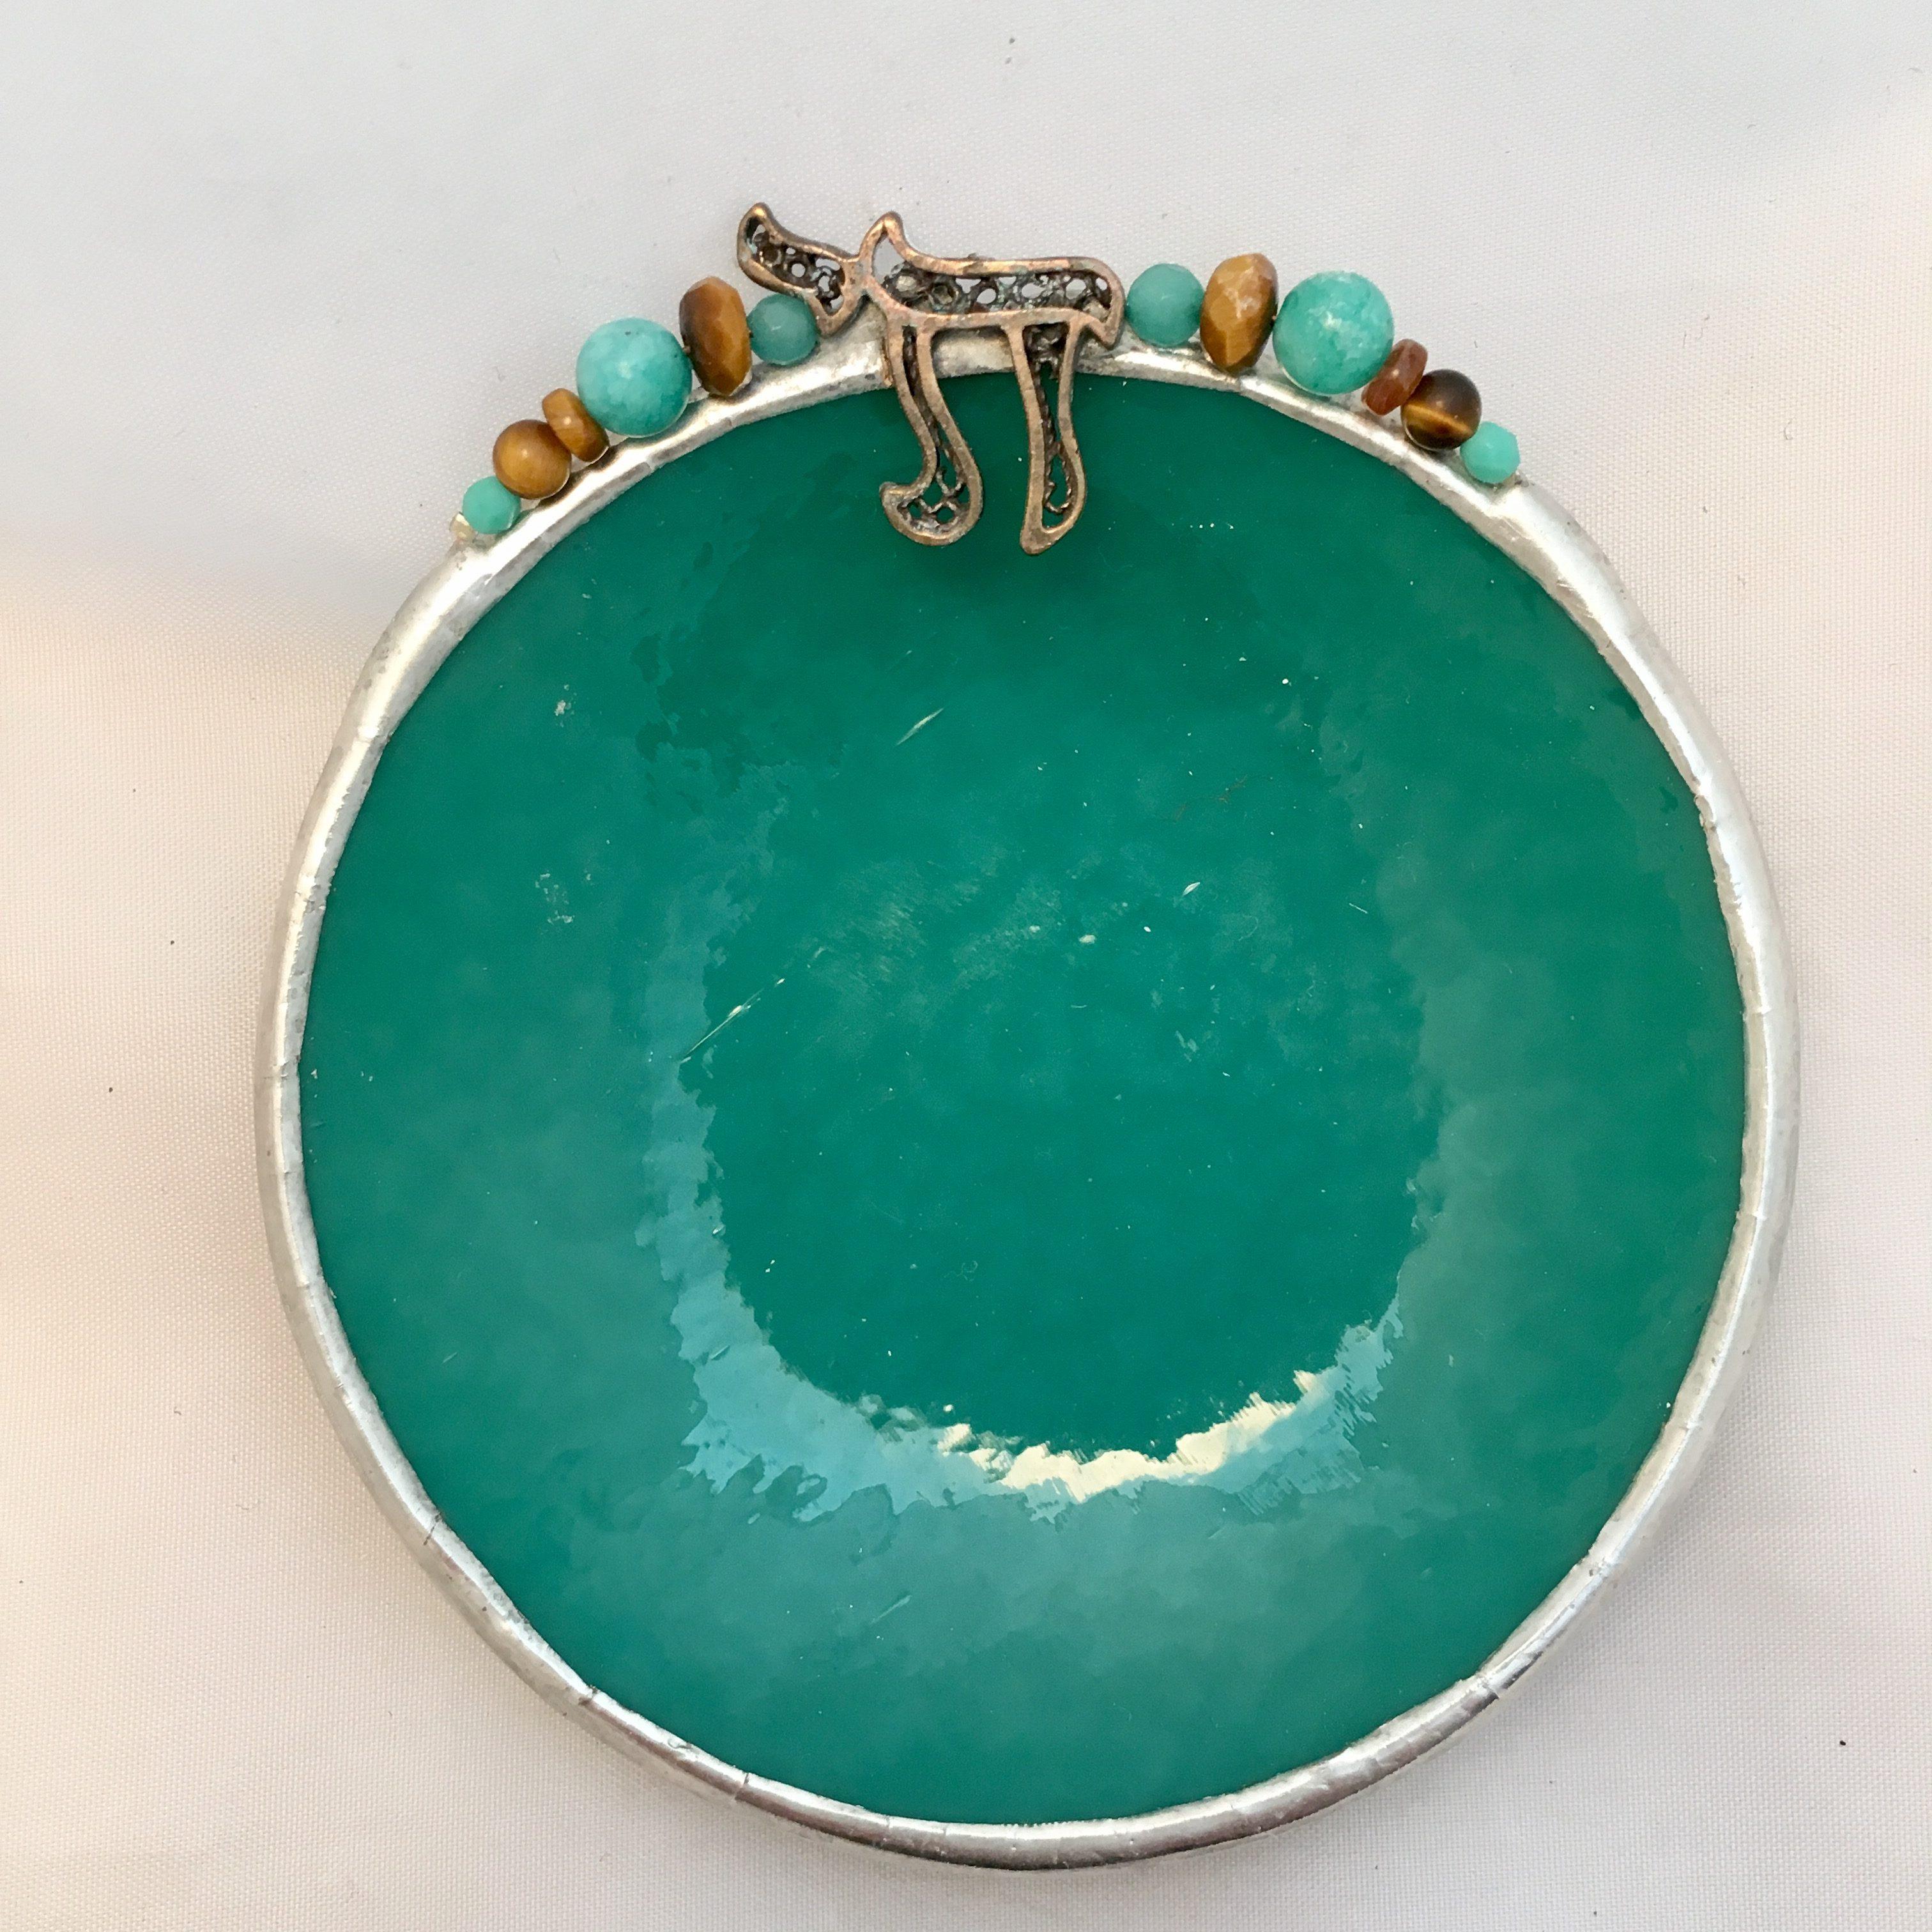 S - Tourquoise Jewish symbol